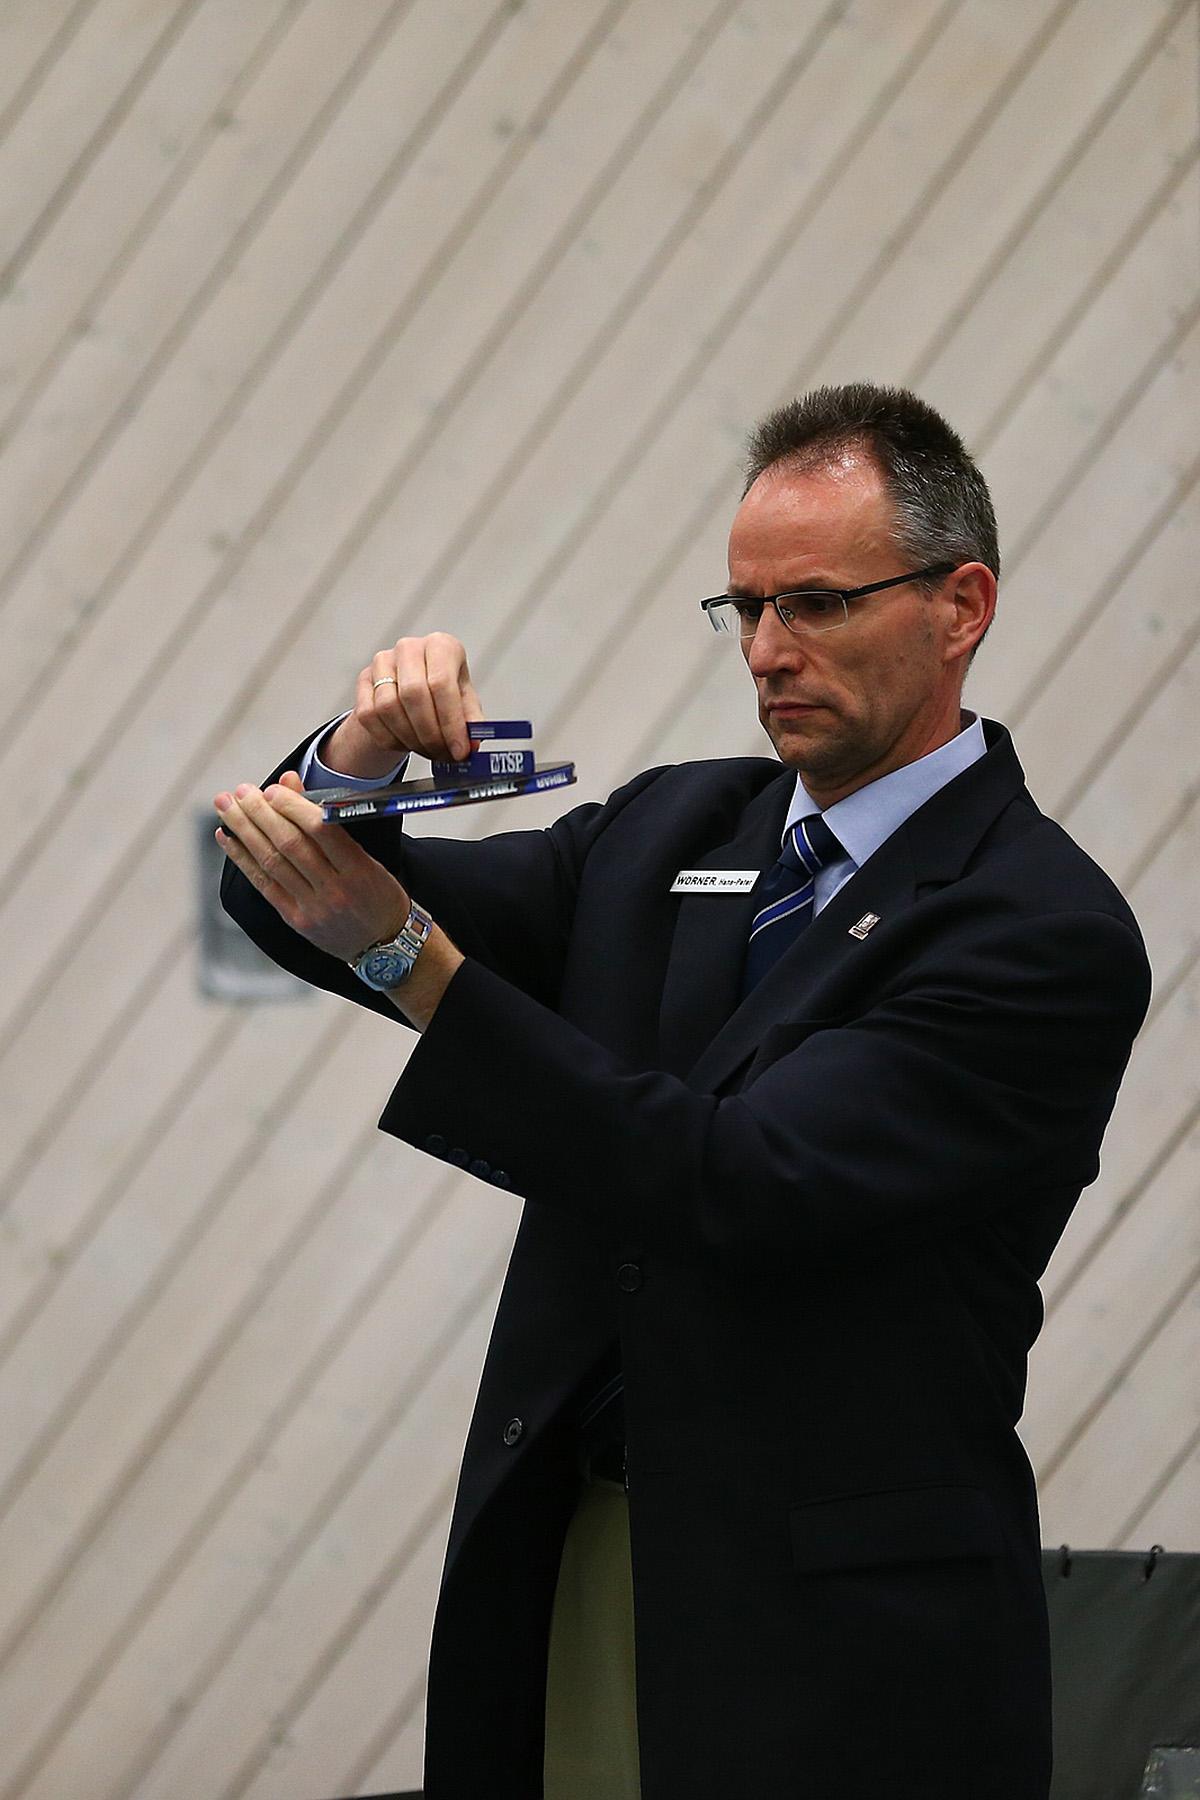 Hans-Peter Wörner